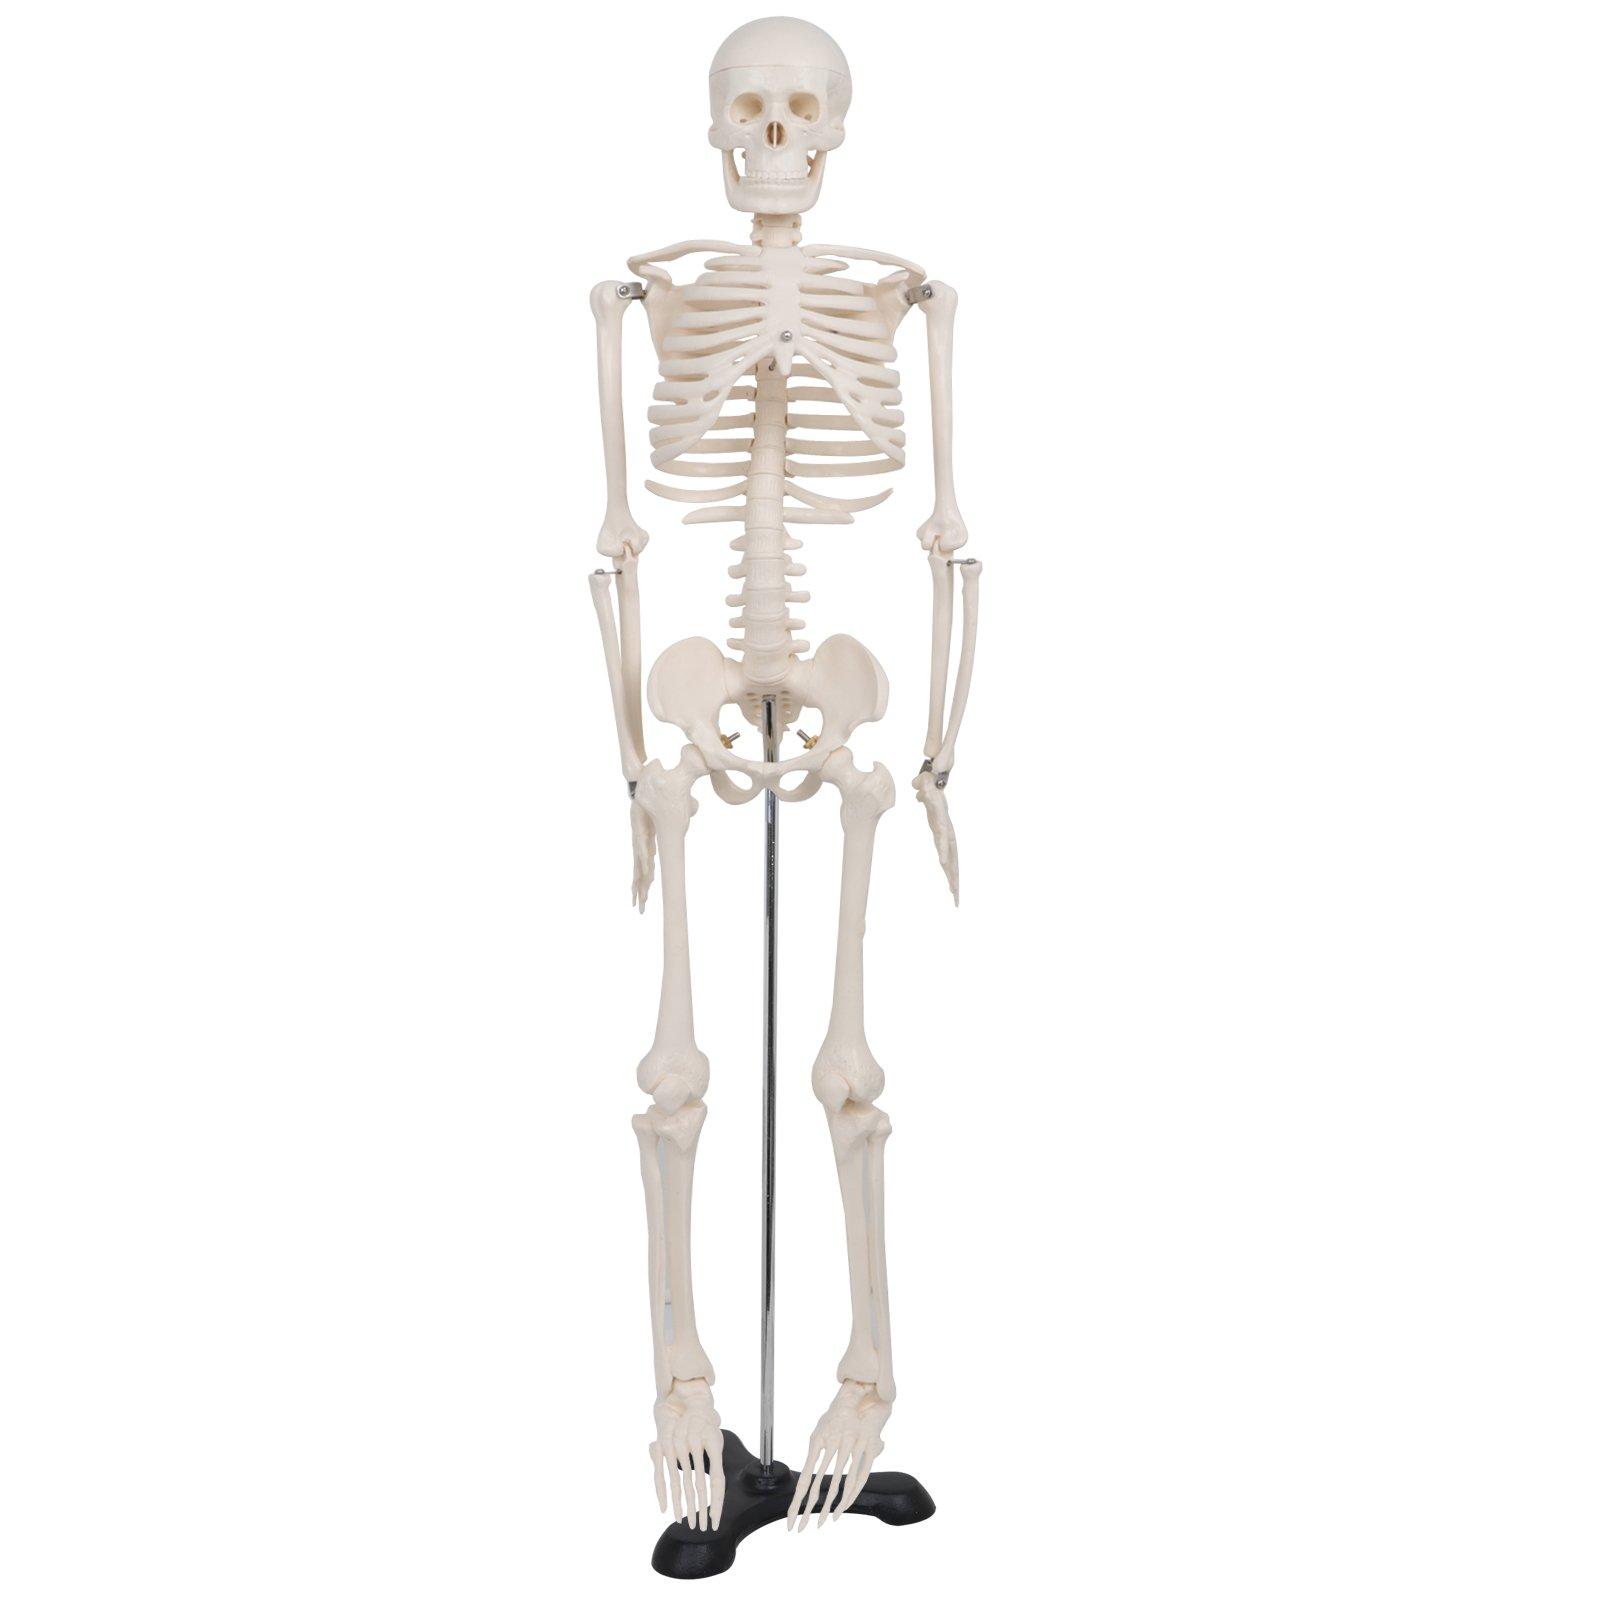 ZENY Mini Size 33.5'' Advanced Medical Human Anatomical Skeleton Model - 1/2 Full Sized + Stand + Bone Number Kit